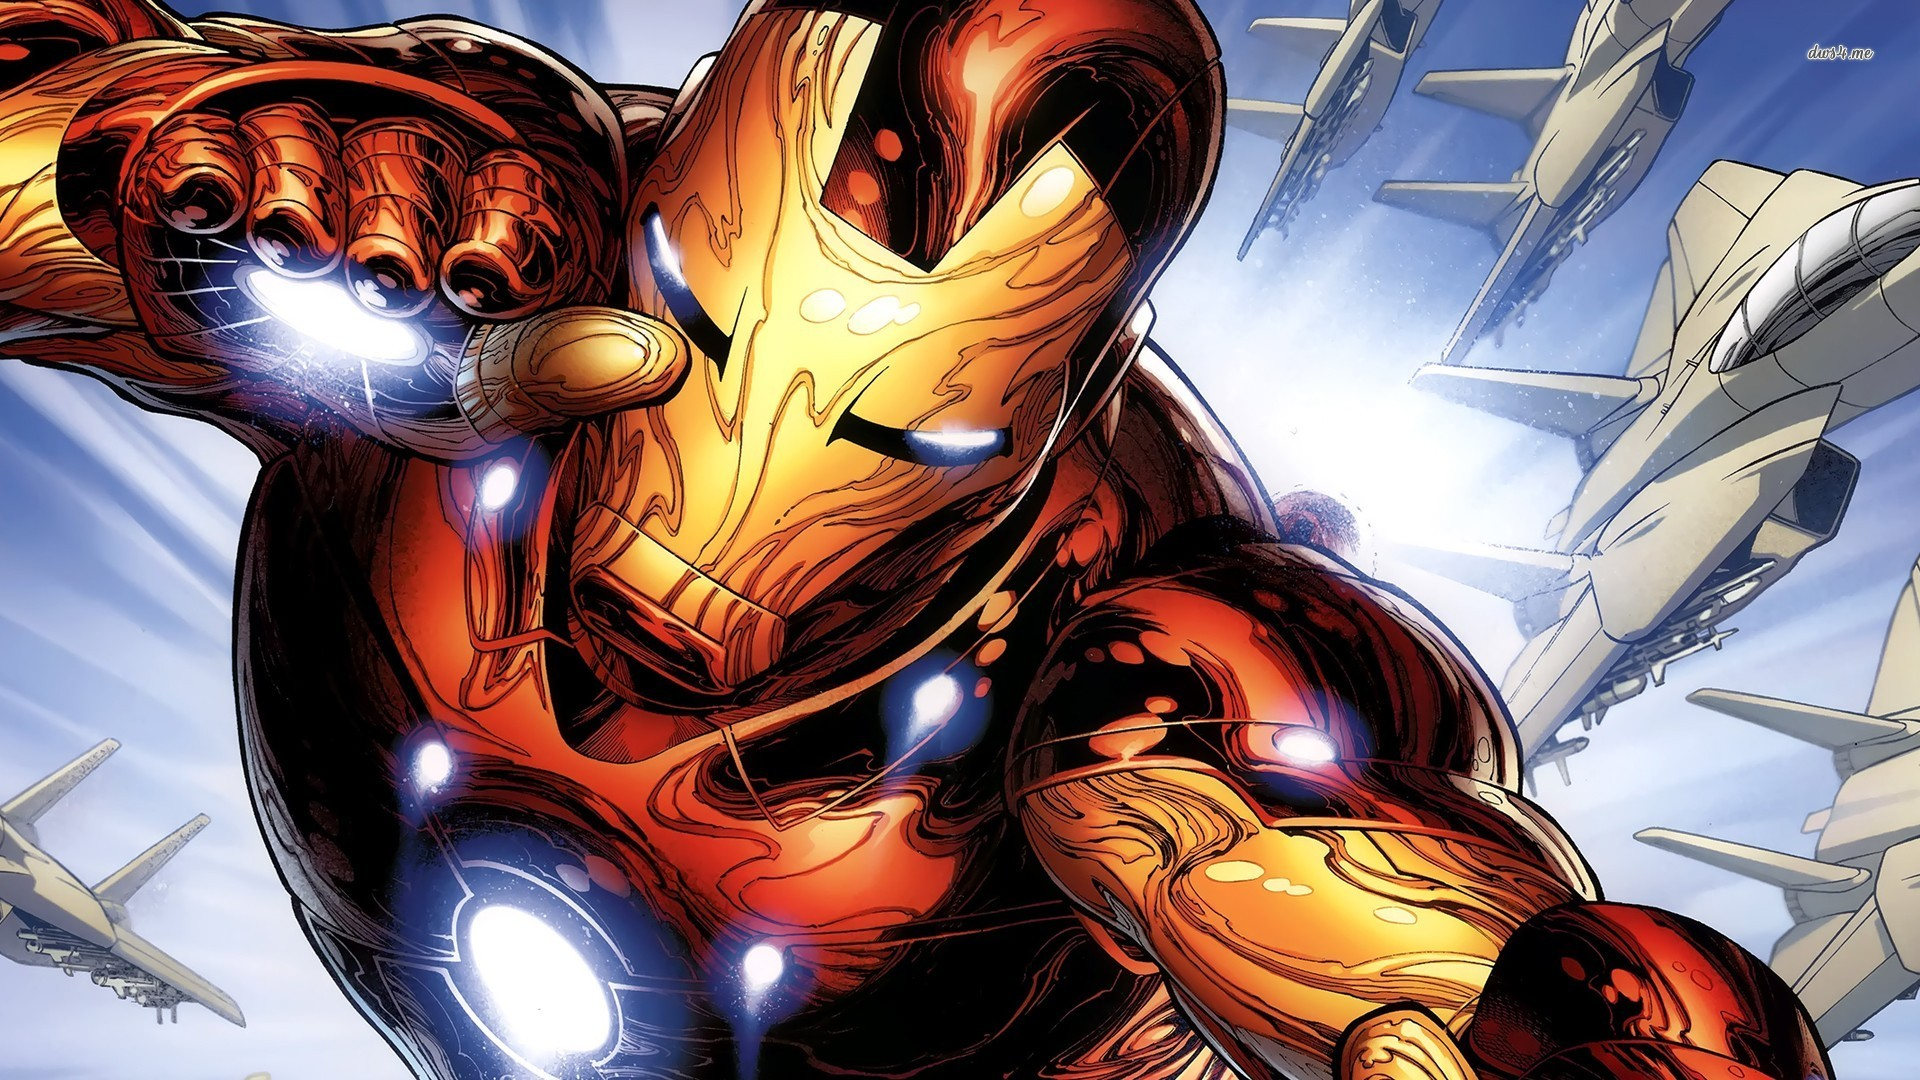 Iron Man Comic Wallpaper Desktop Background - Wickedsa com